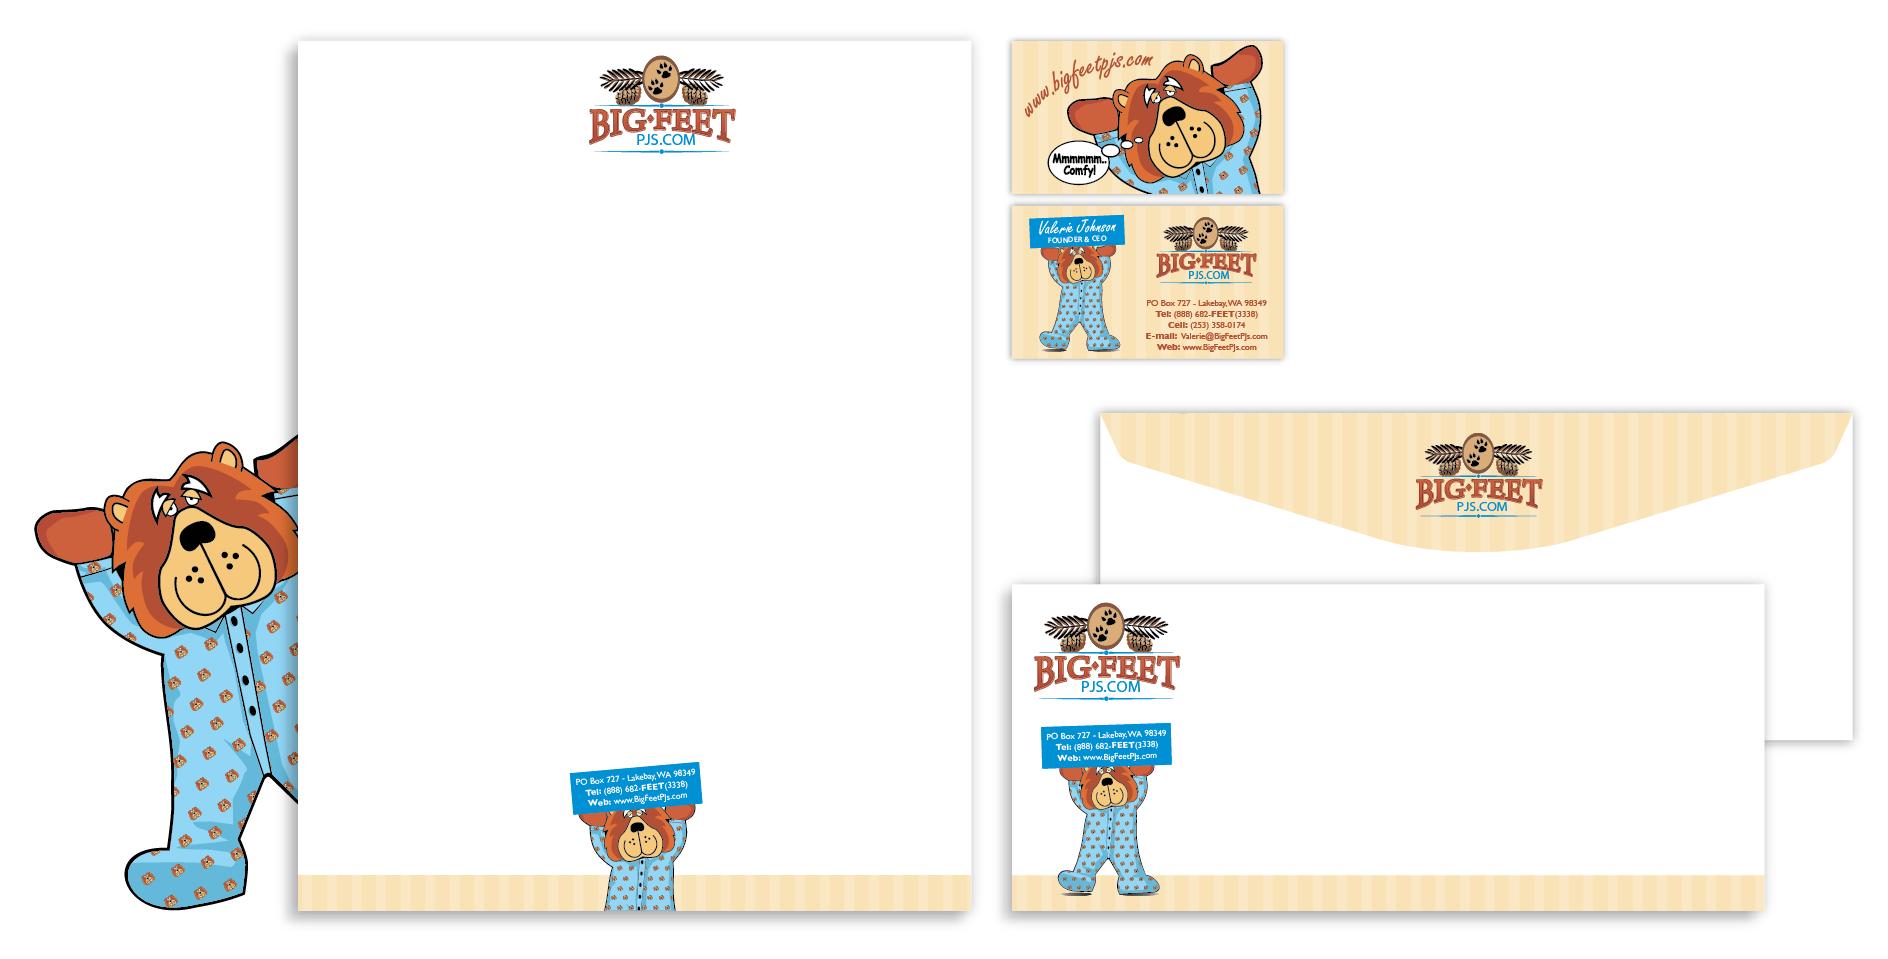 Big Feet Pajama Co. needs biz cards/stationary